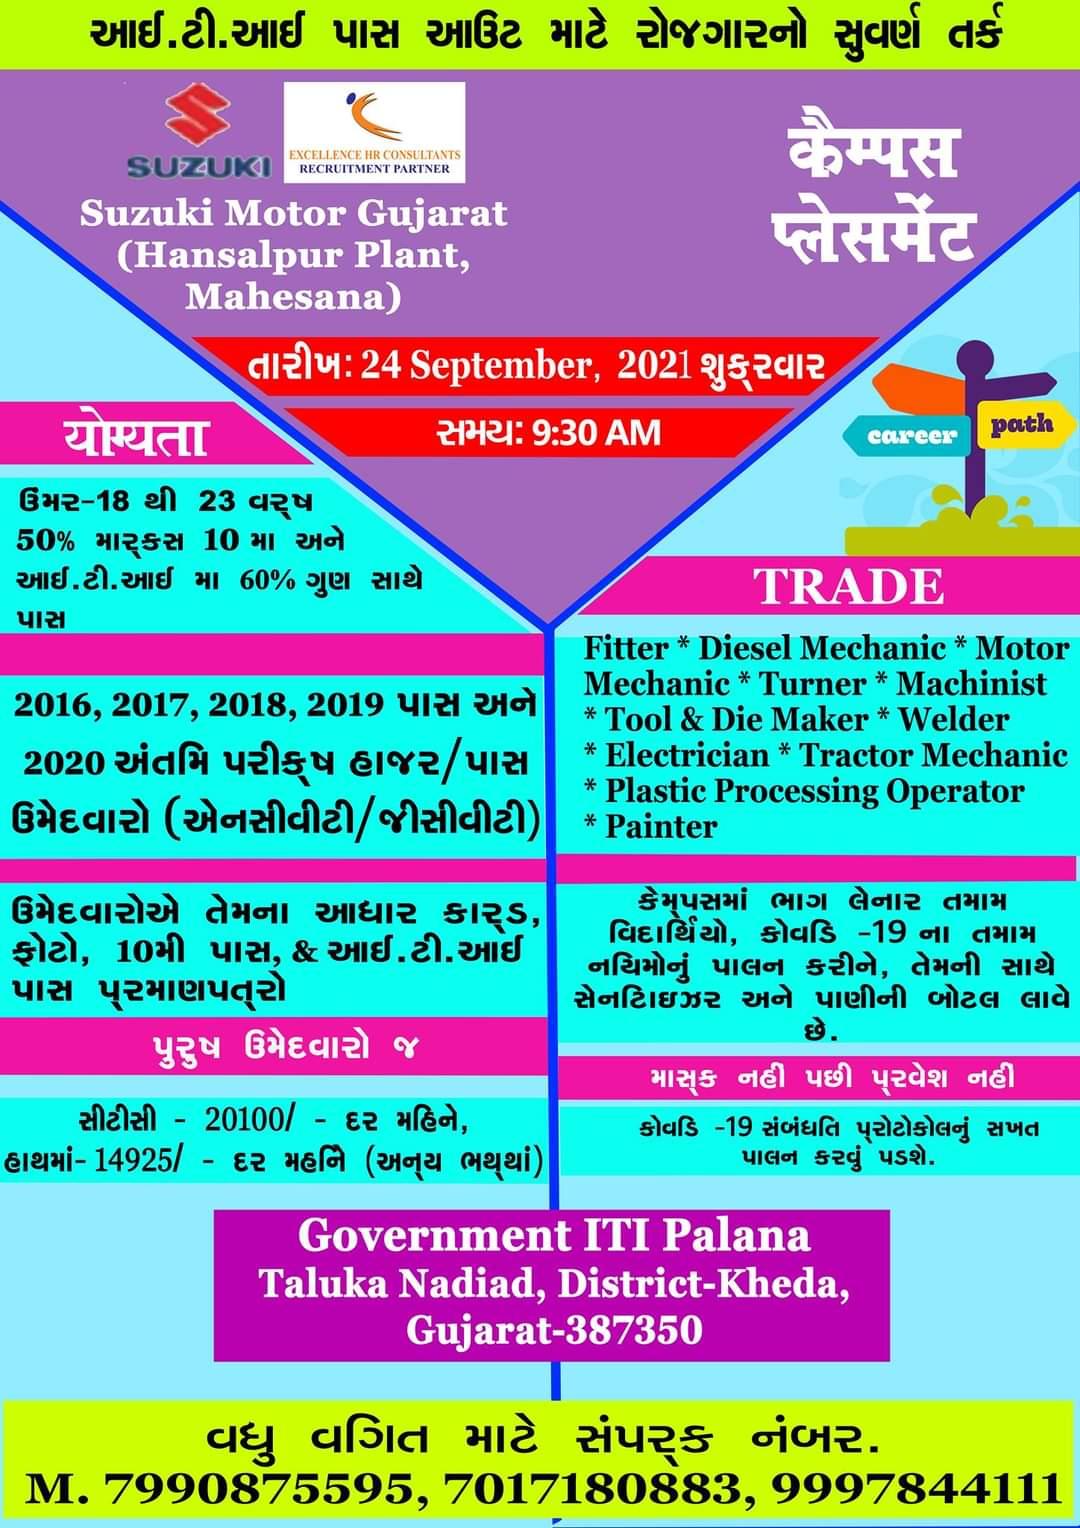 Suzuki Motors Cars Manufacturing Plant - ITI Campus Placemat Recruitment at Govt ITI Palana, Gujarat